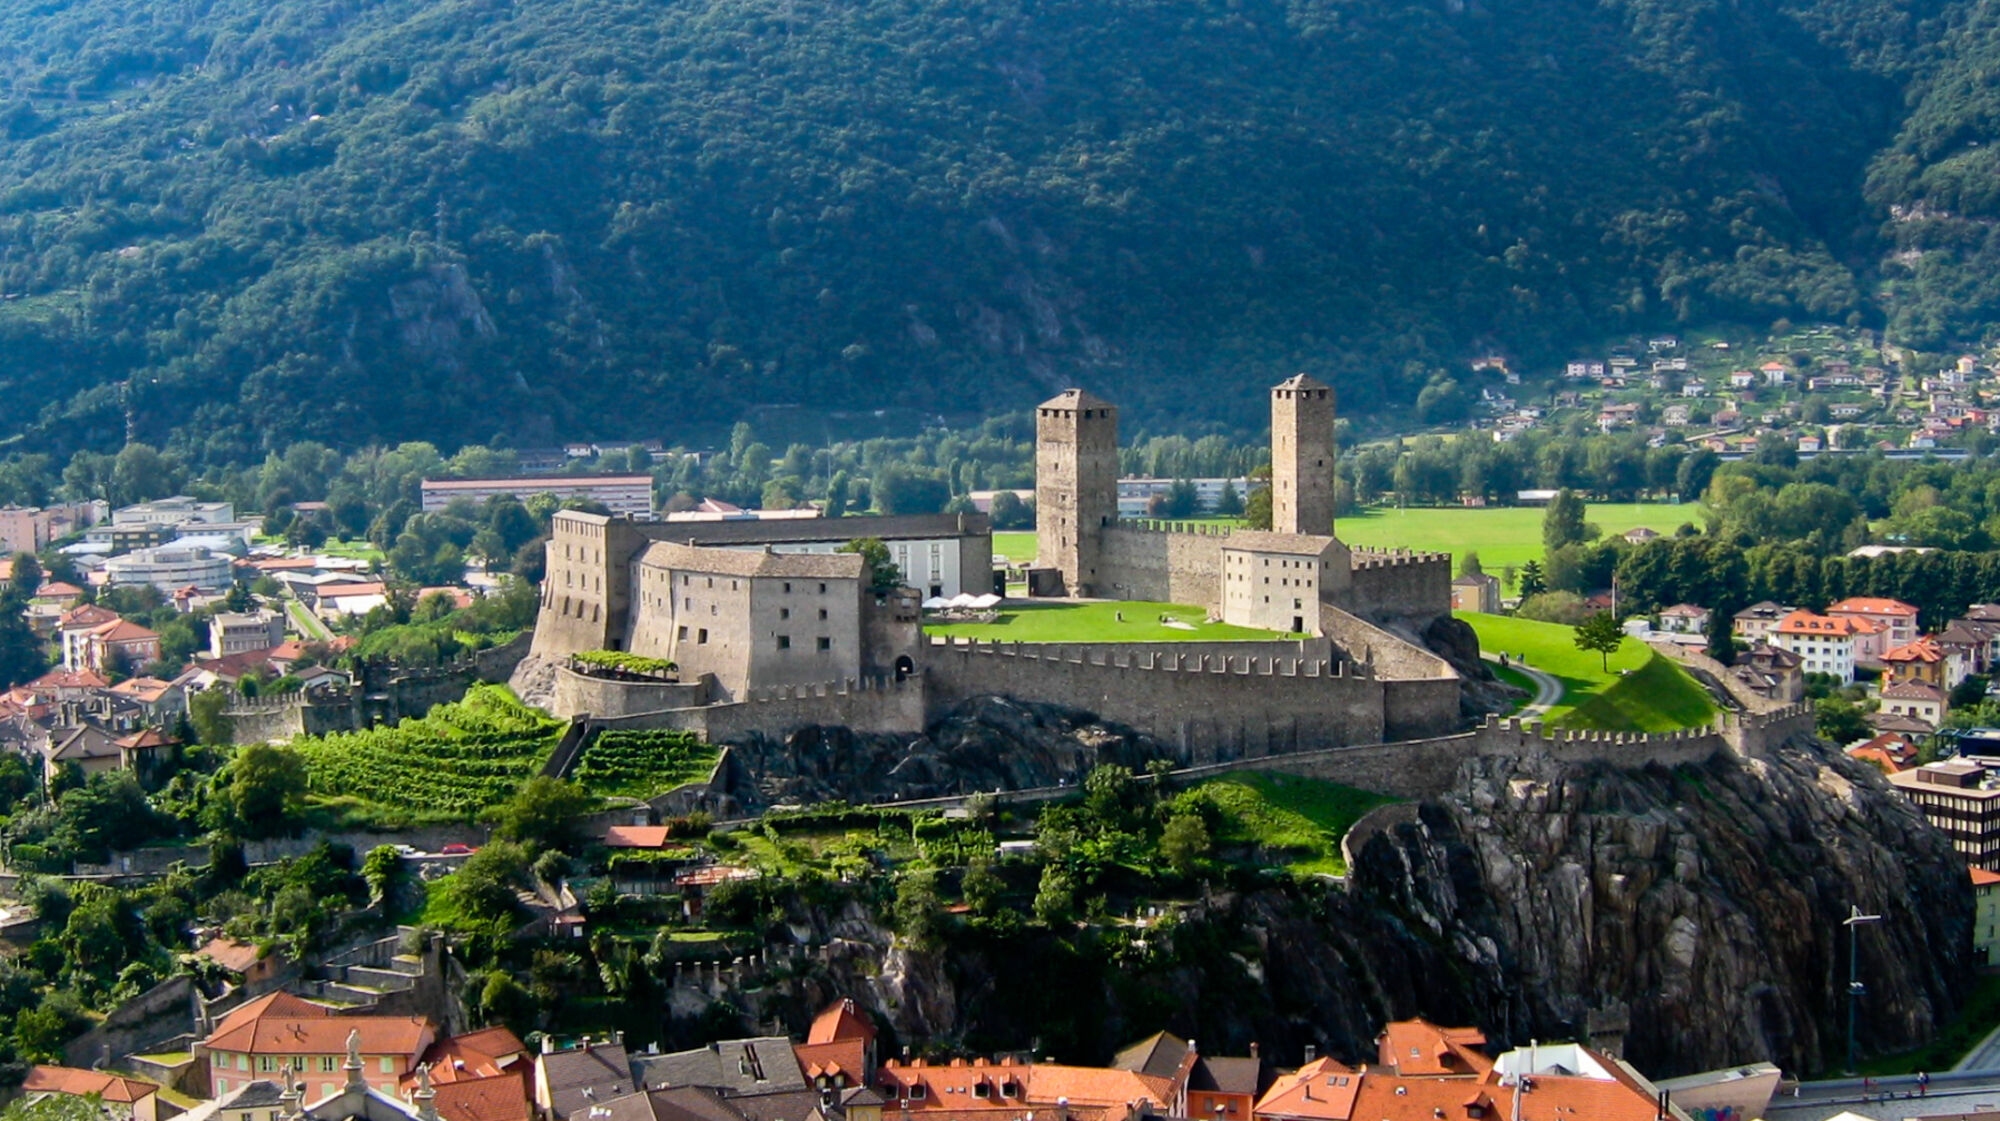 Blick auf Castelgrande Bellinzona